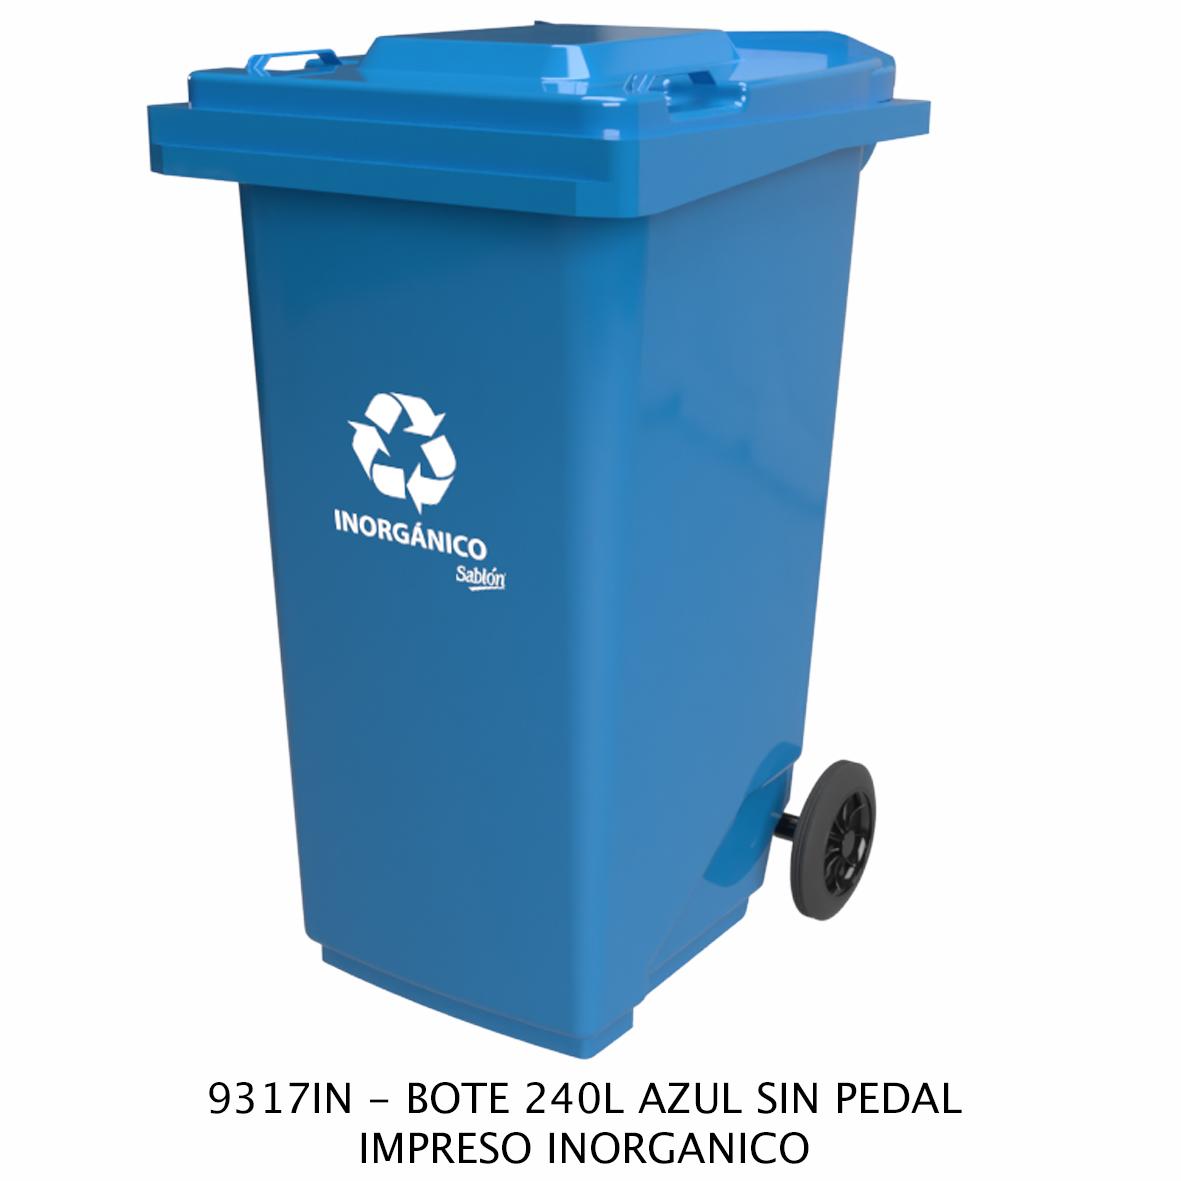 Bote de basura de 240 litros sin pedal con impreso inorgánico color azul modelo 9317IN de Sablón